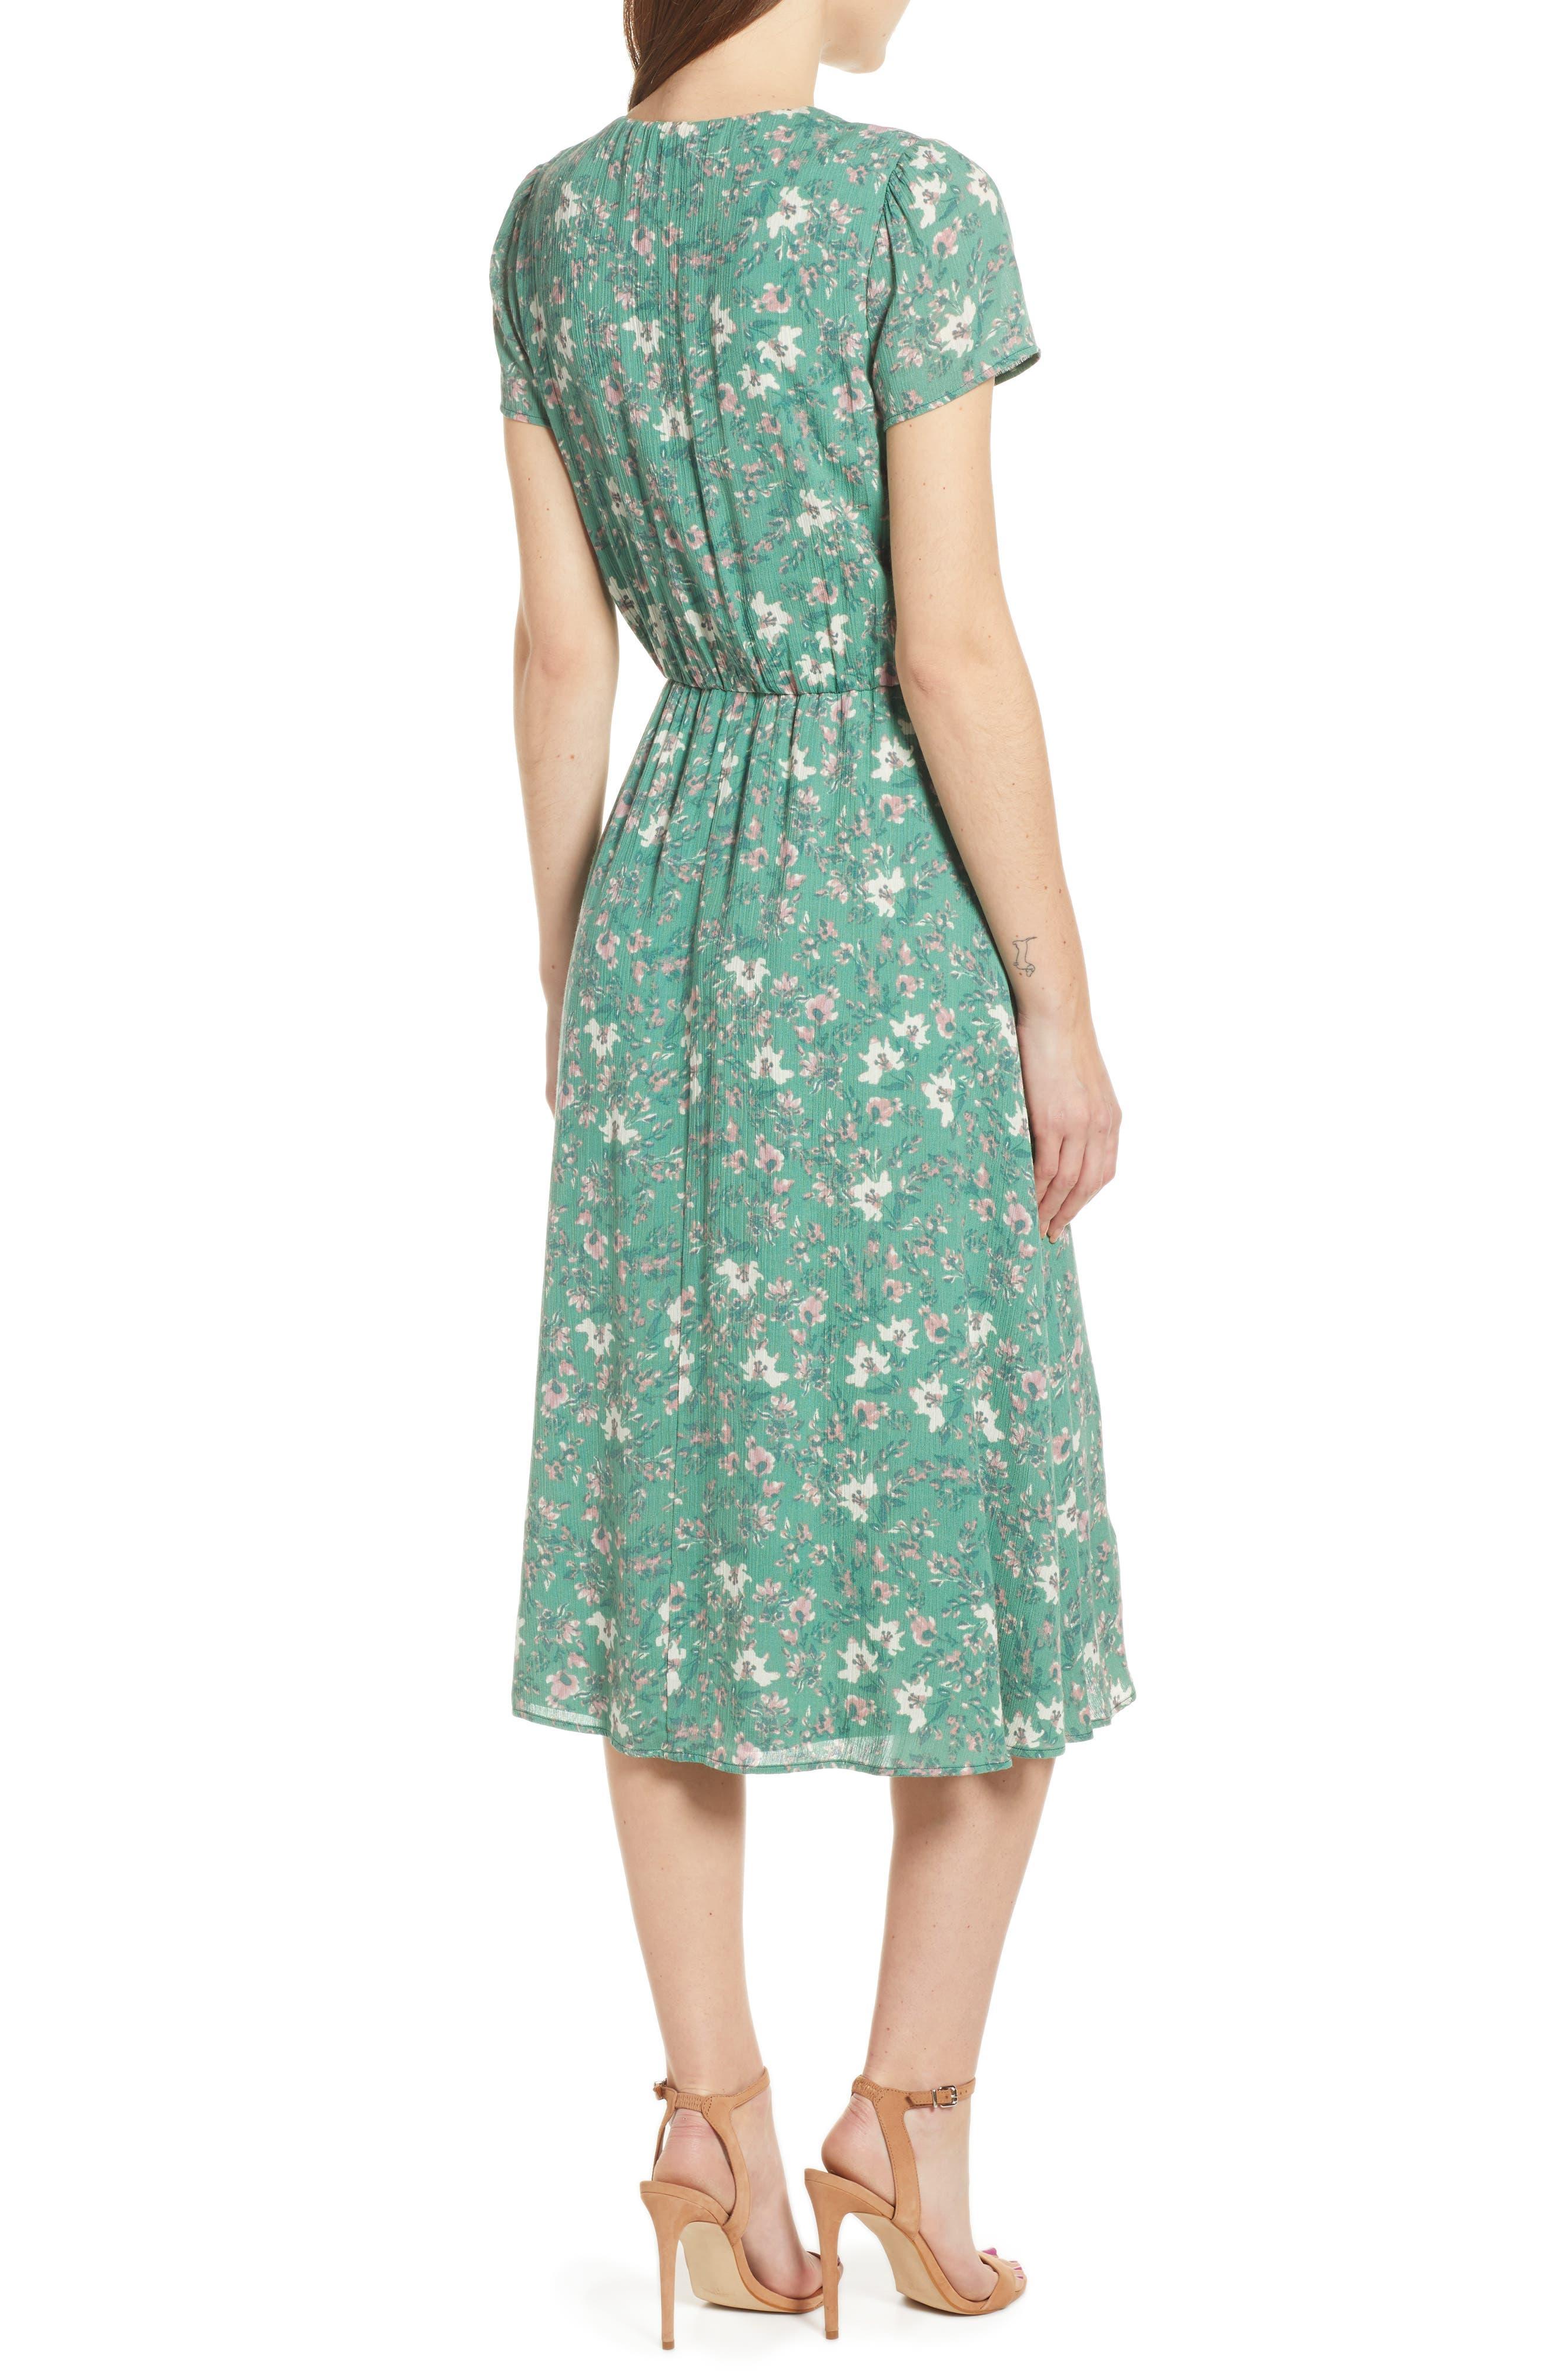 71176a41cbf Women s A-Line Dresses